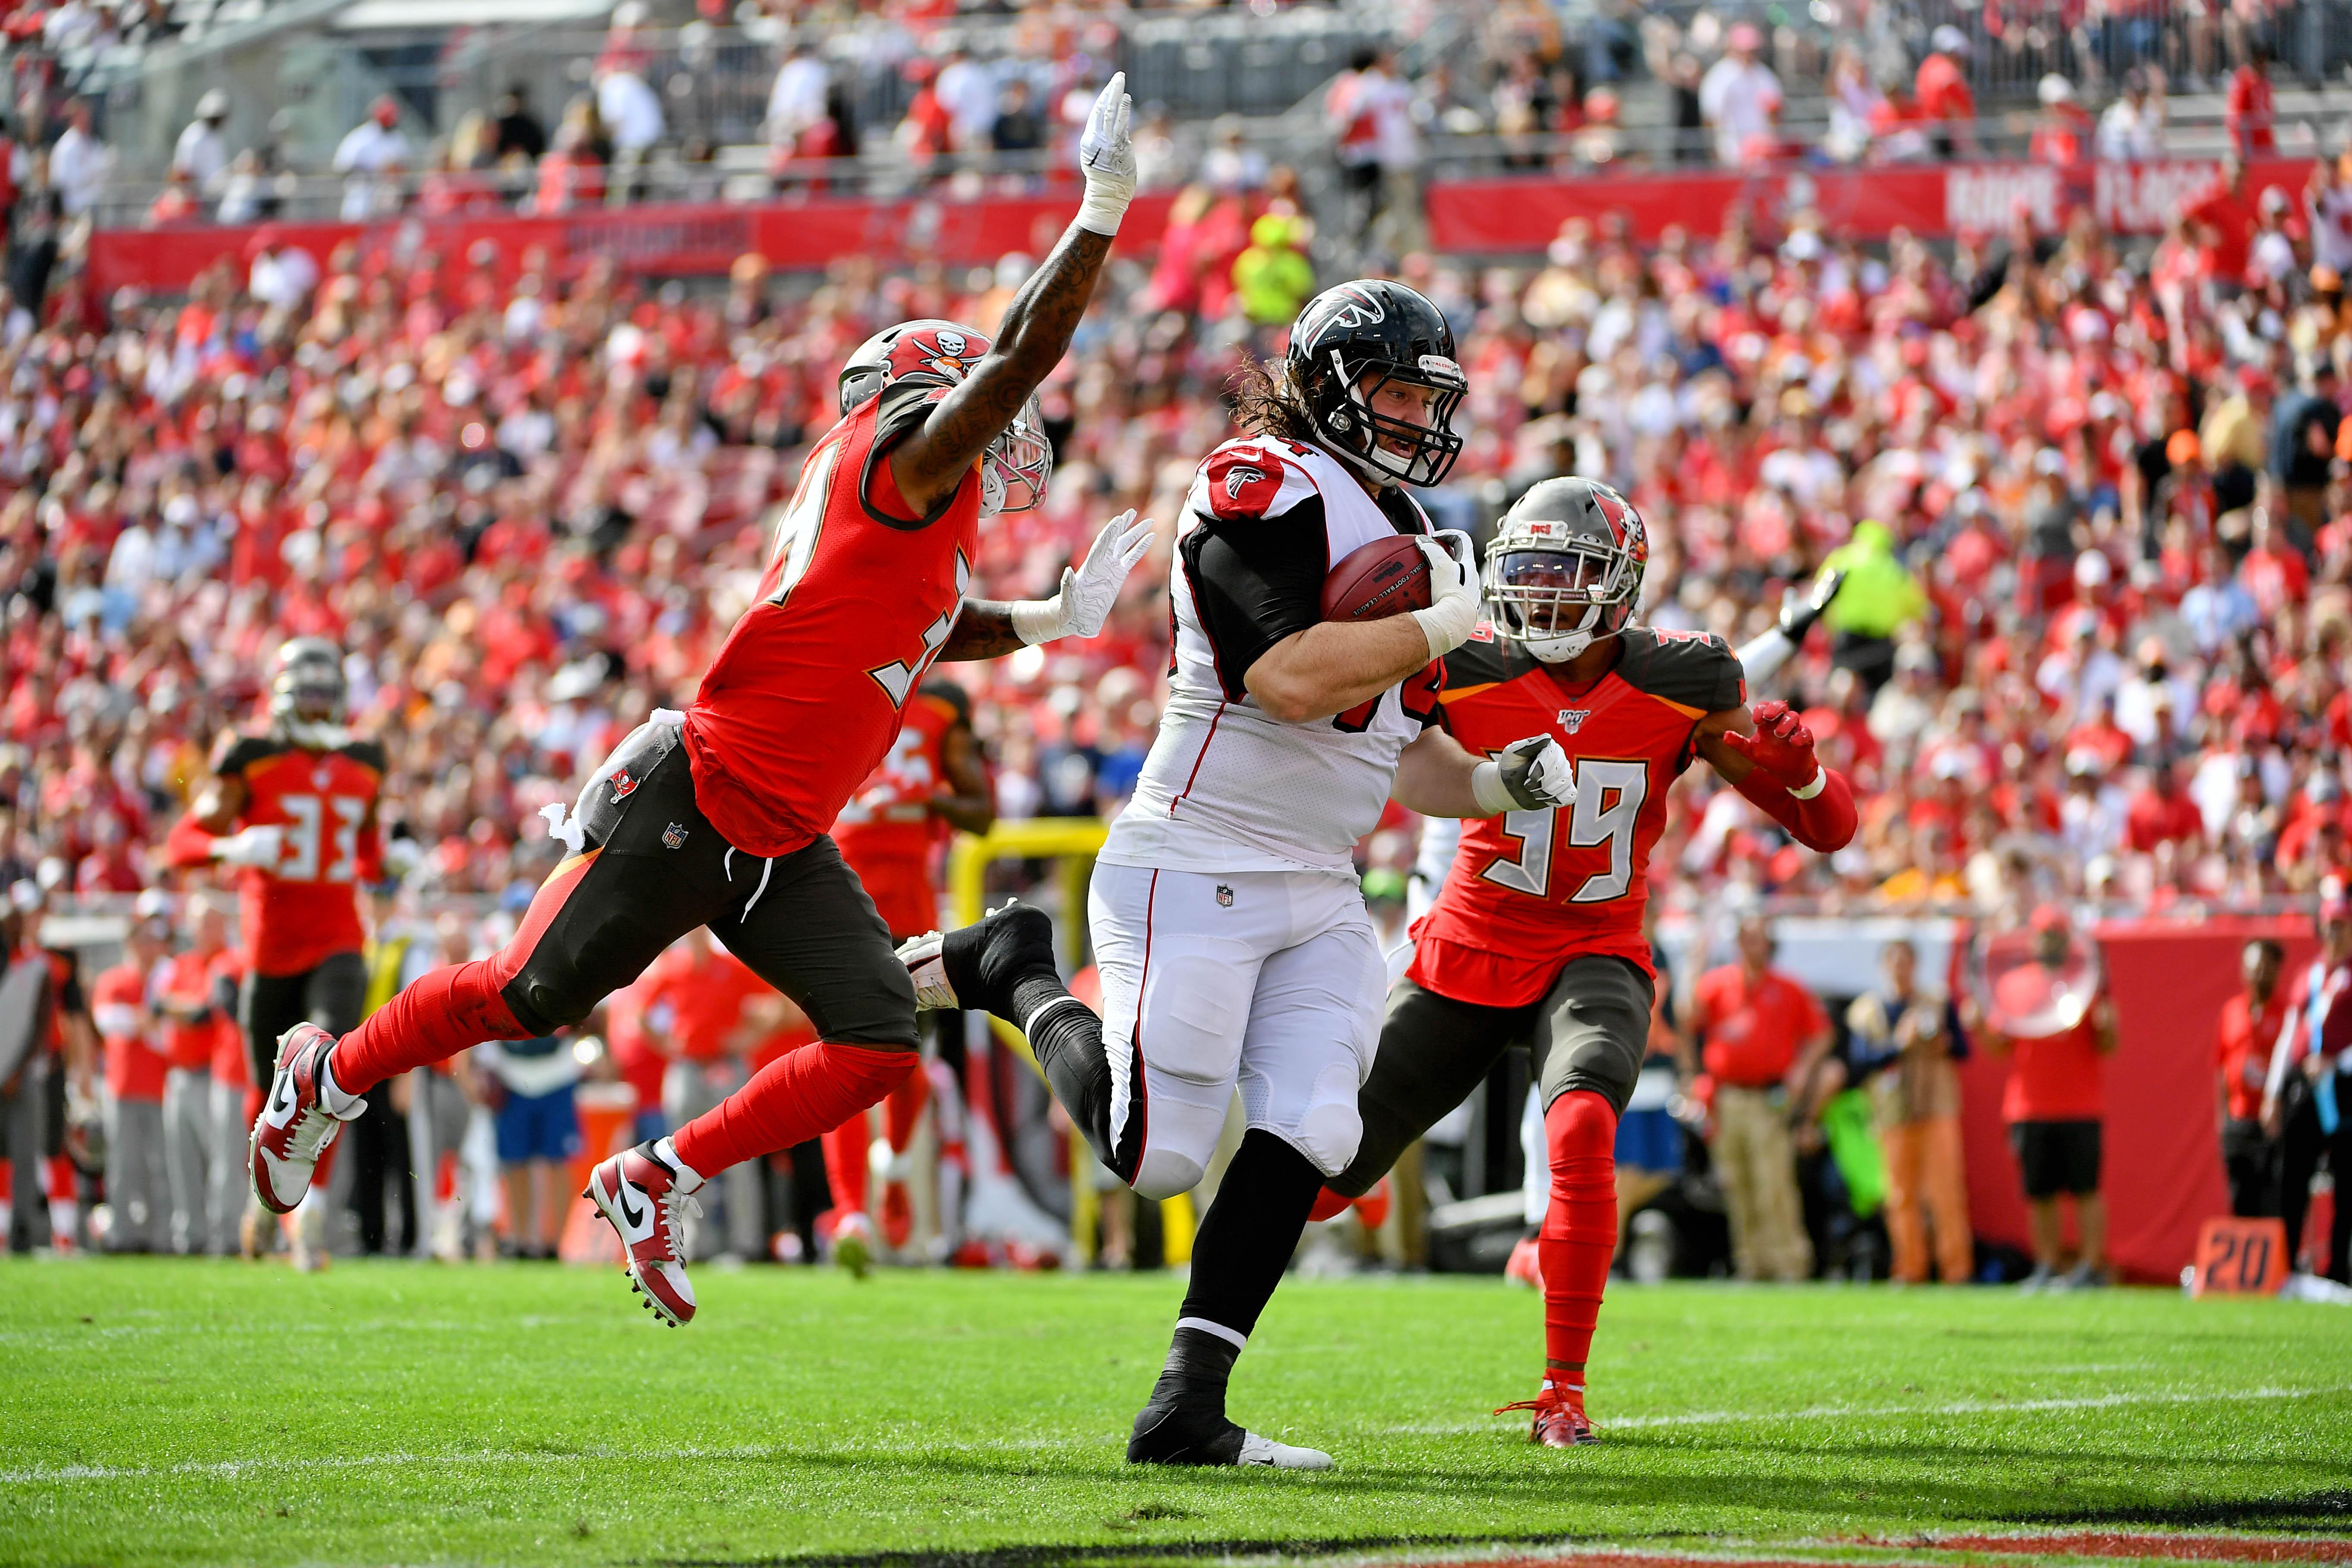 Watch: Falcons 311-lb OL Ty Sambrailo scores 'big guy touchdown' vs Bucs